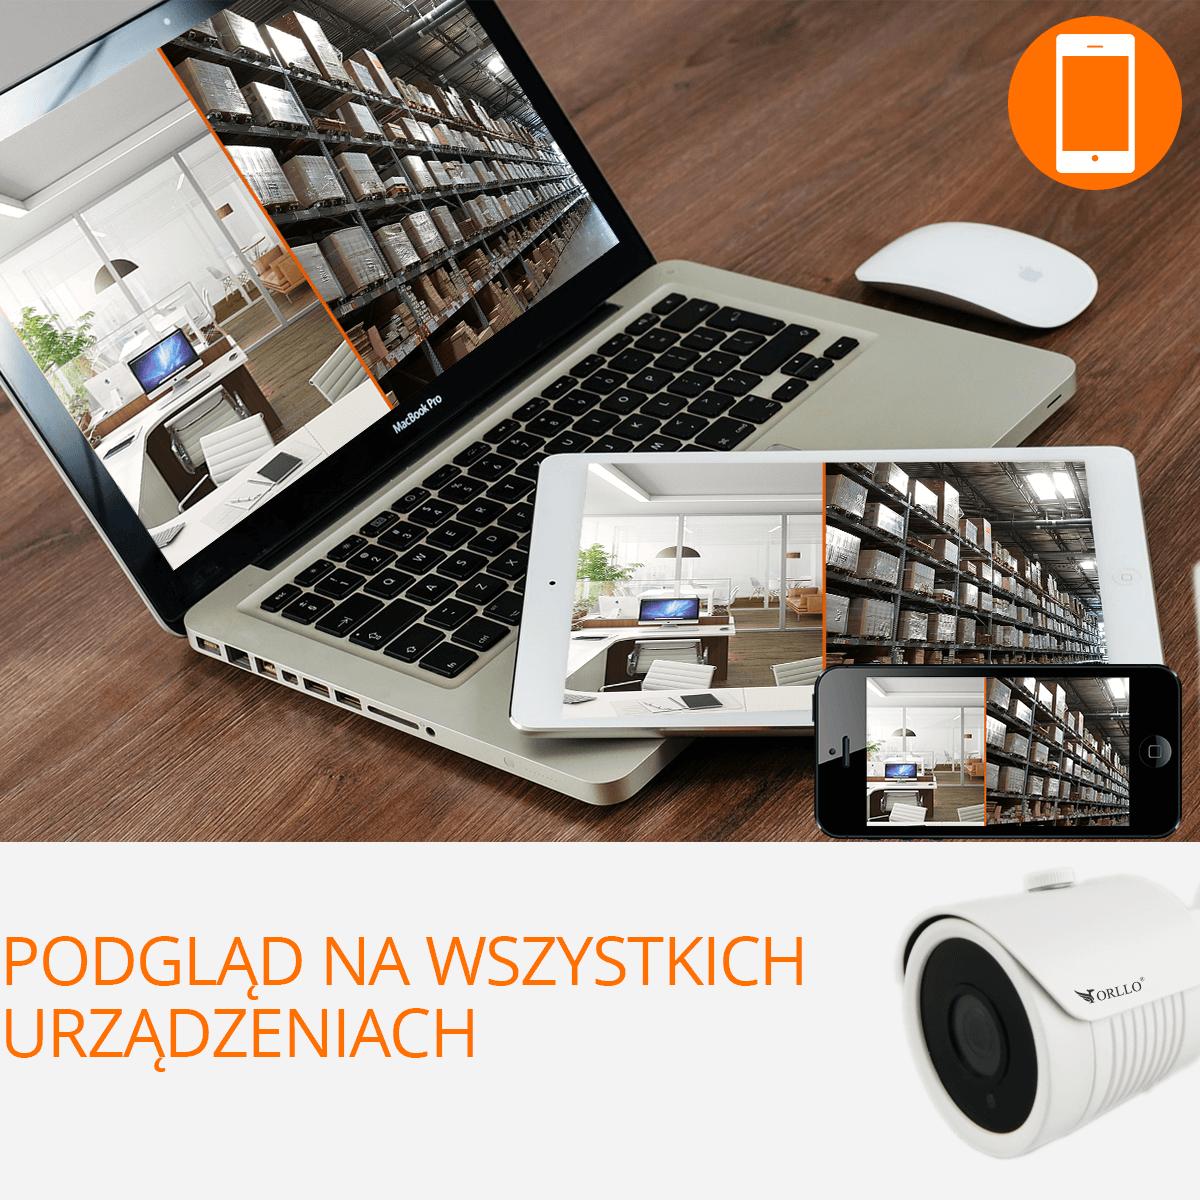 Zestaw-do-monitoringu-CAMSET-podgląd-orllo-pl